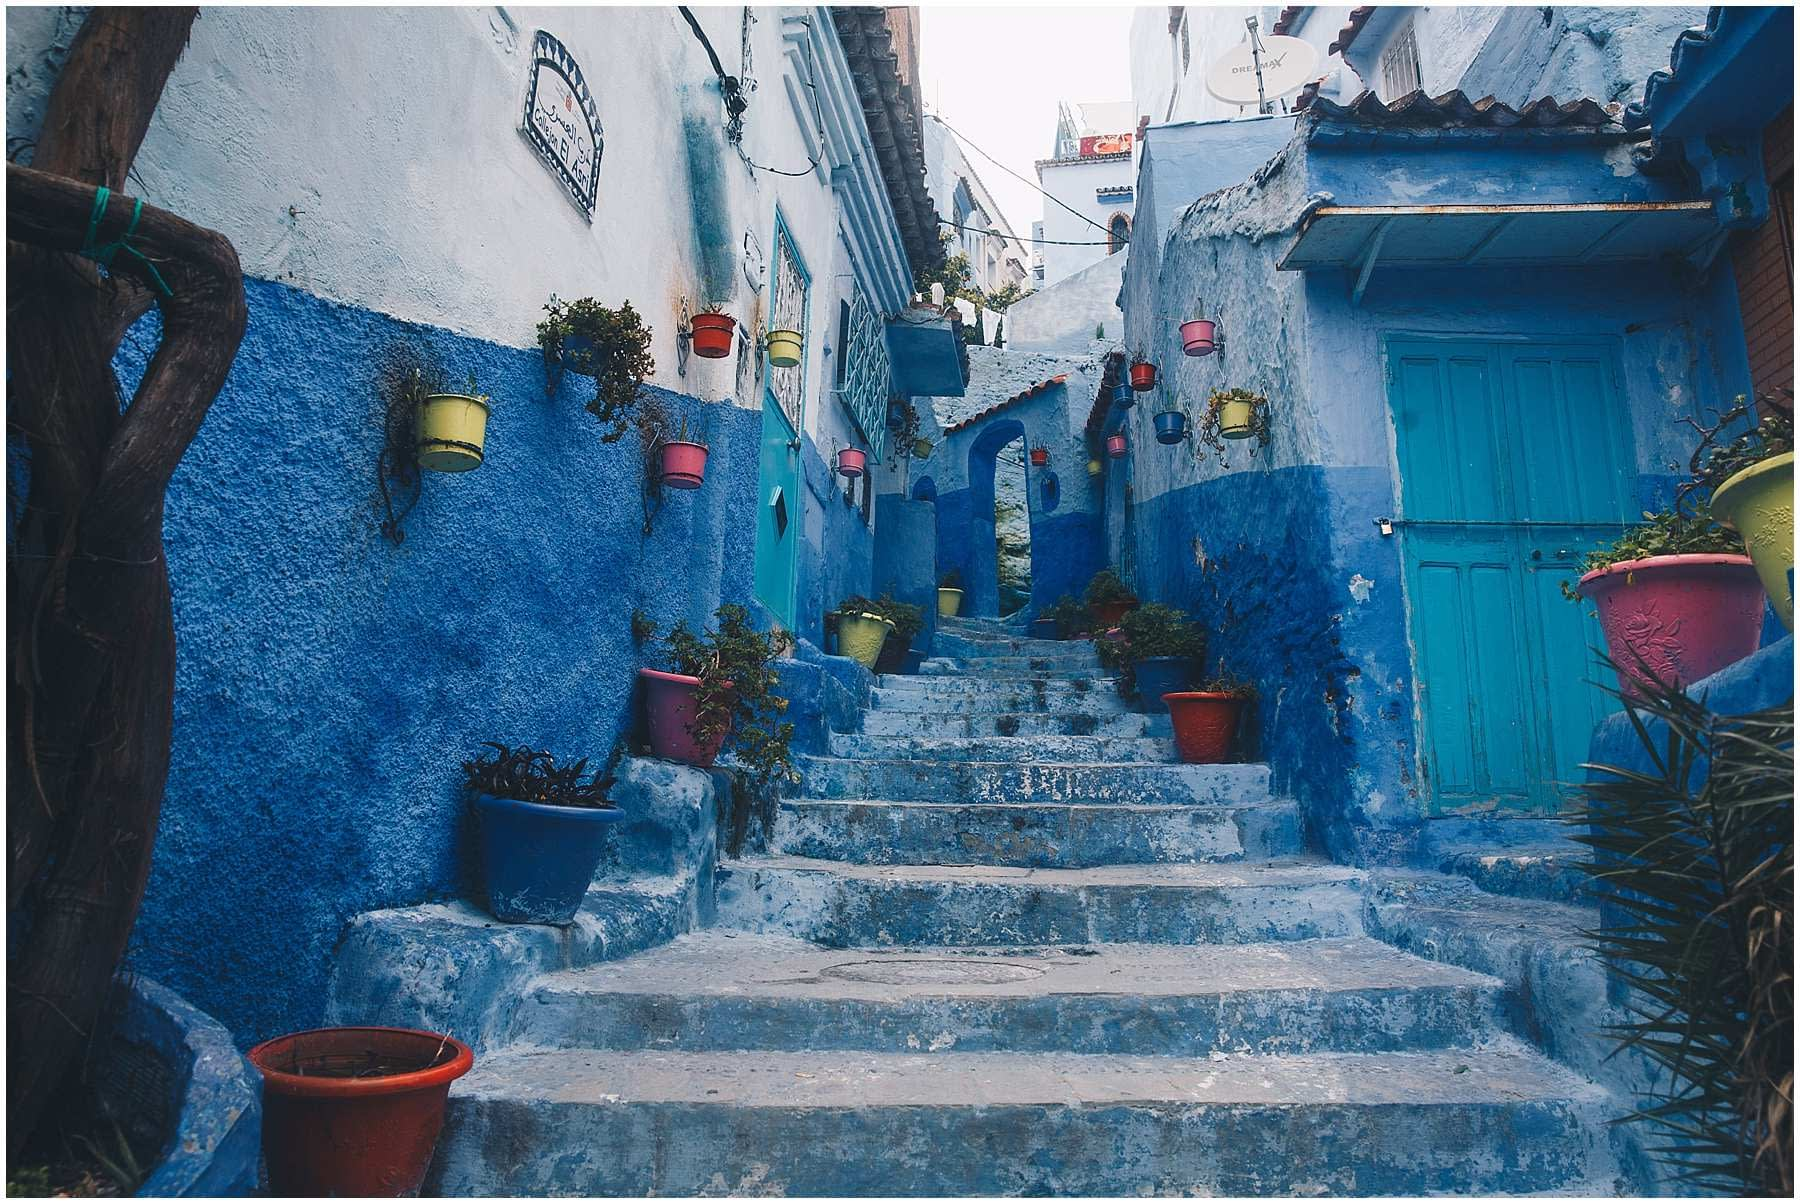 Morocco Chefchaouen_0028.jpg